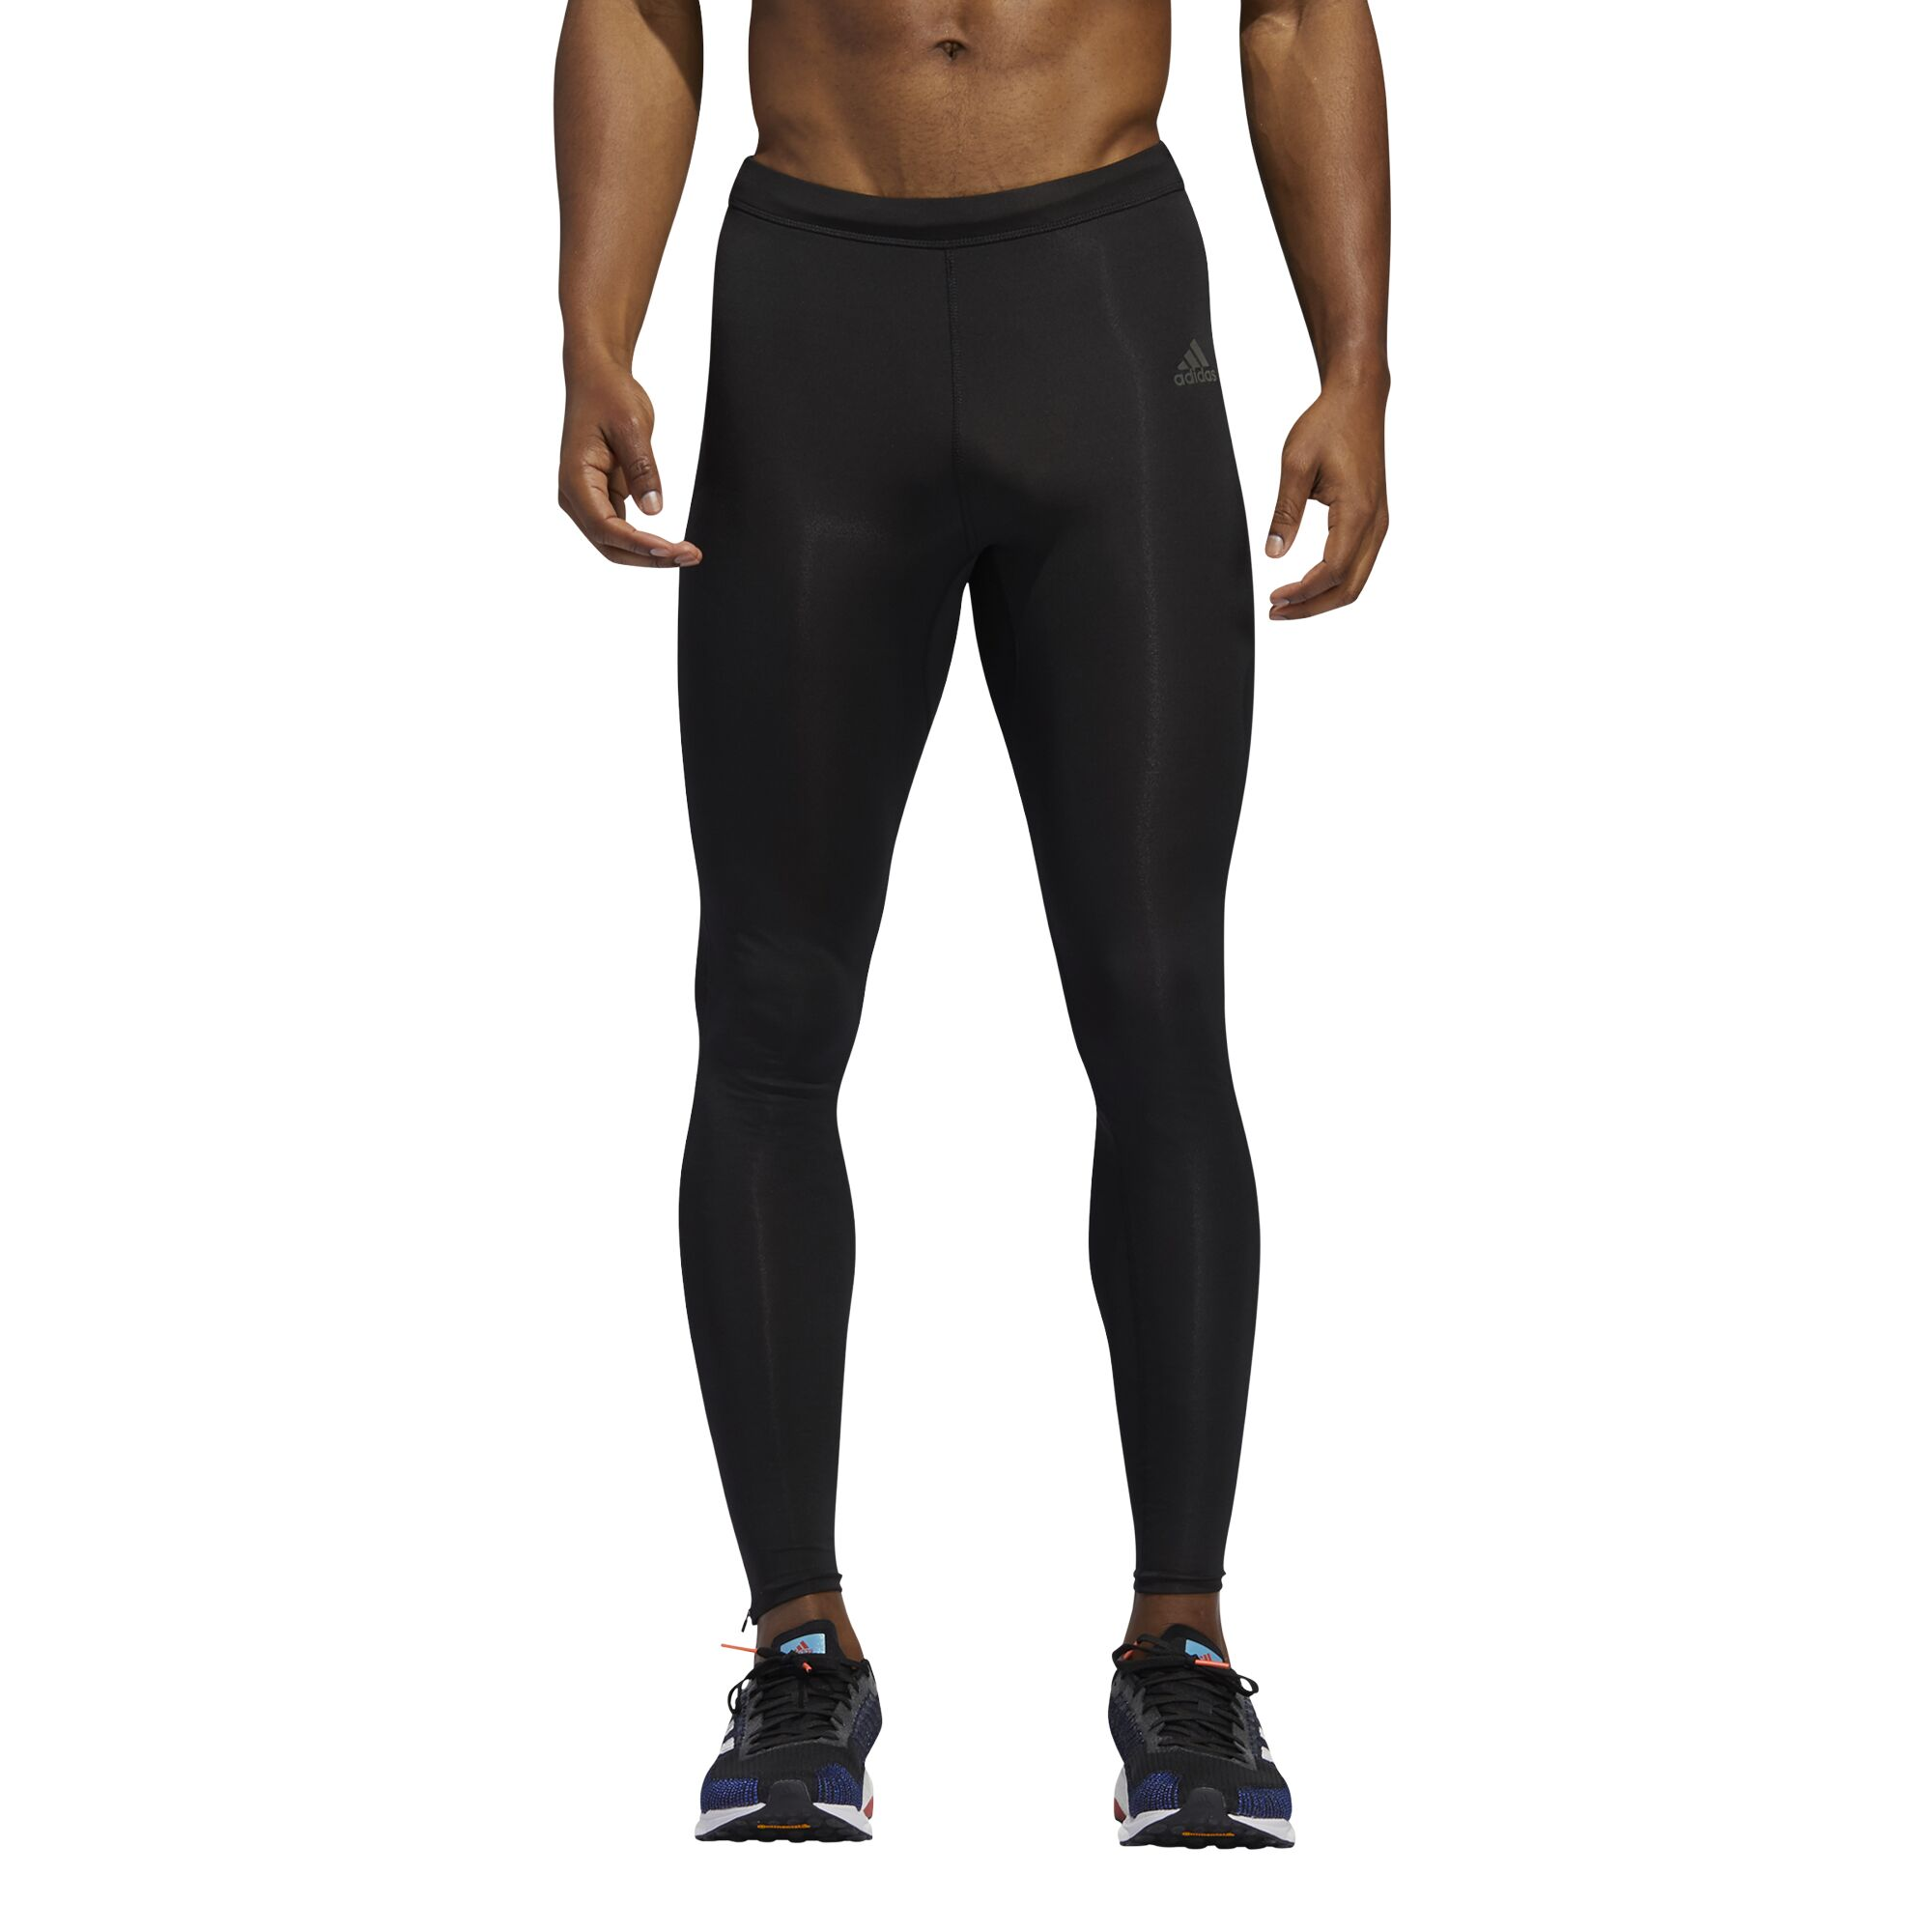 adidas Own The Run Longtight (Black)